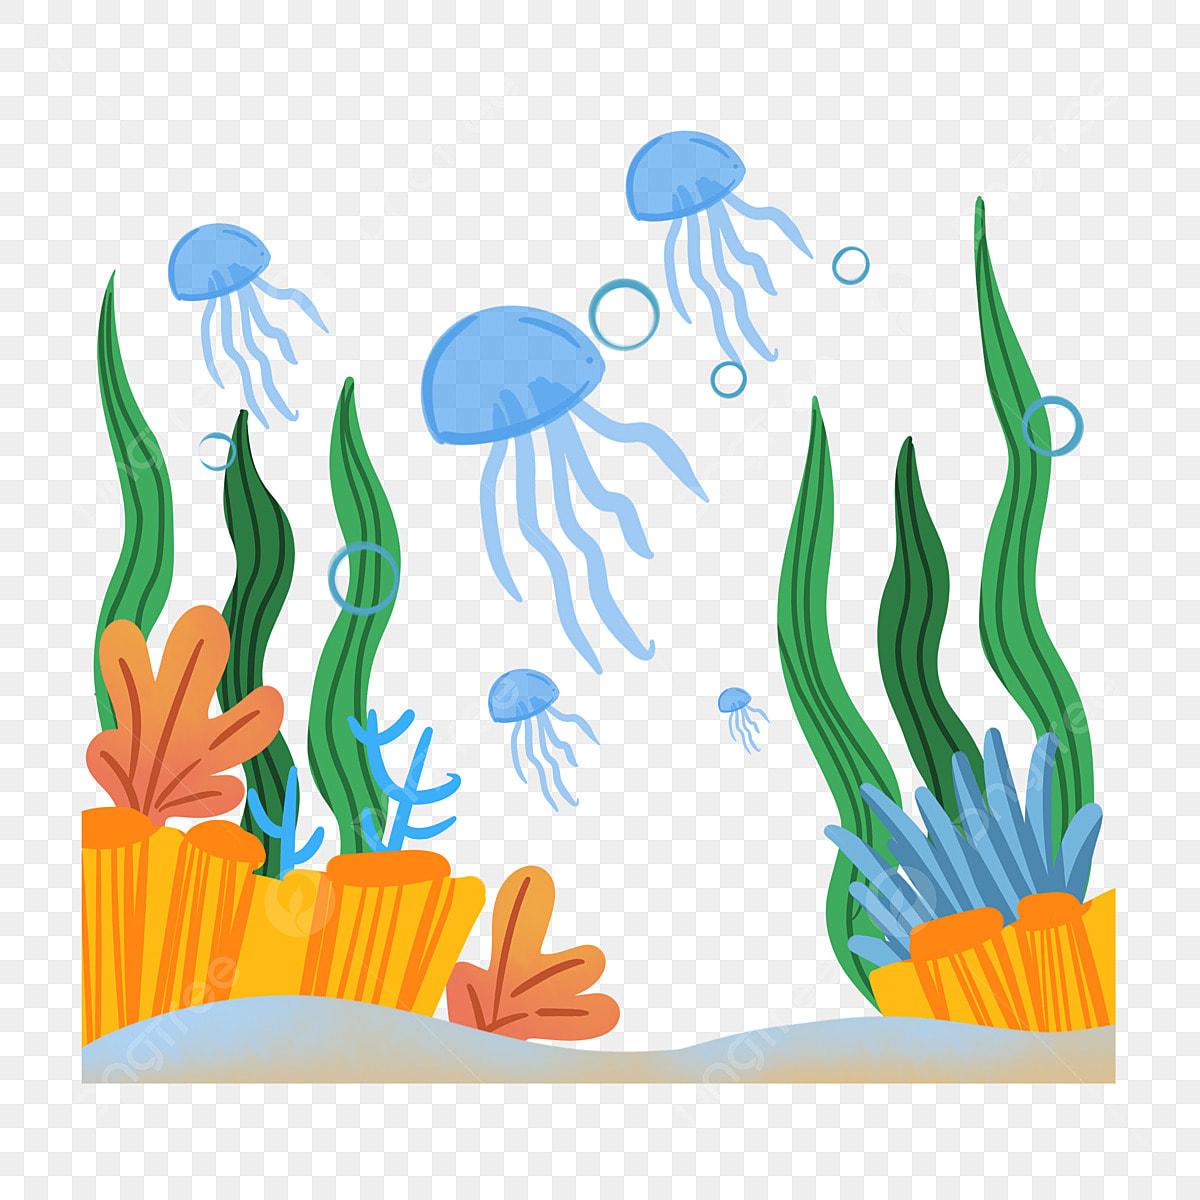 Kartun Kartun Dunia Bawah Air Dunia Bawah Laut Batu Rumput